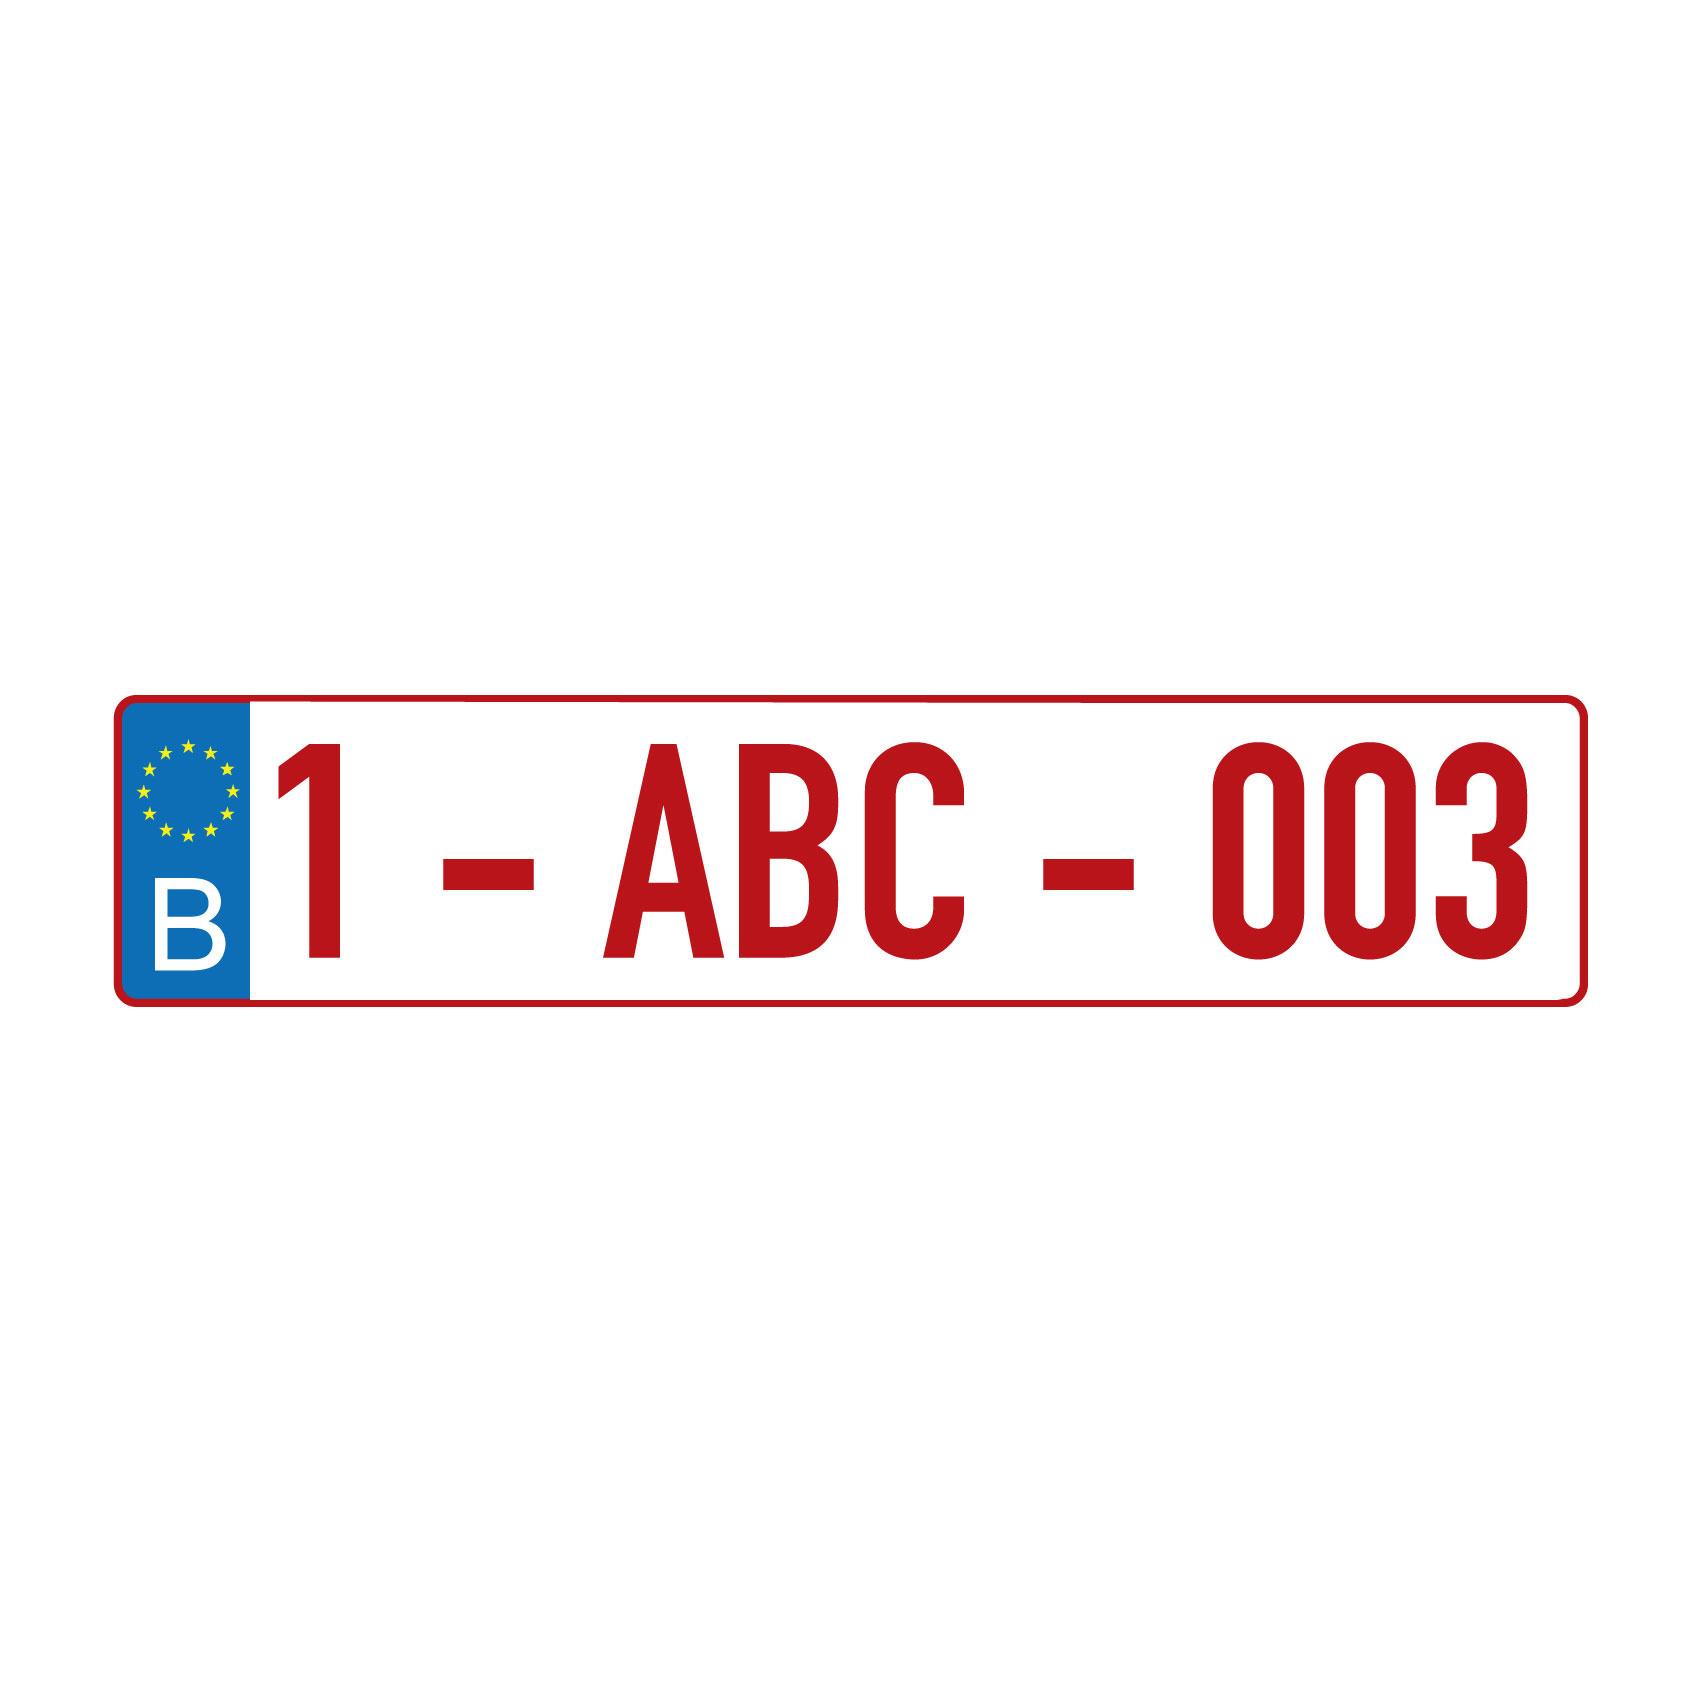 Nederlands kenteken sticker - Copy